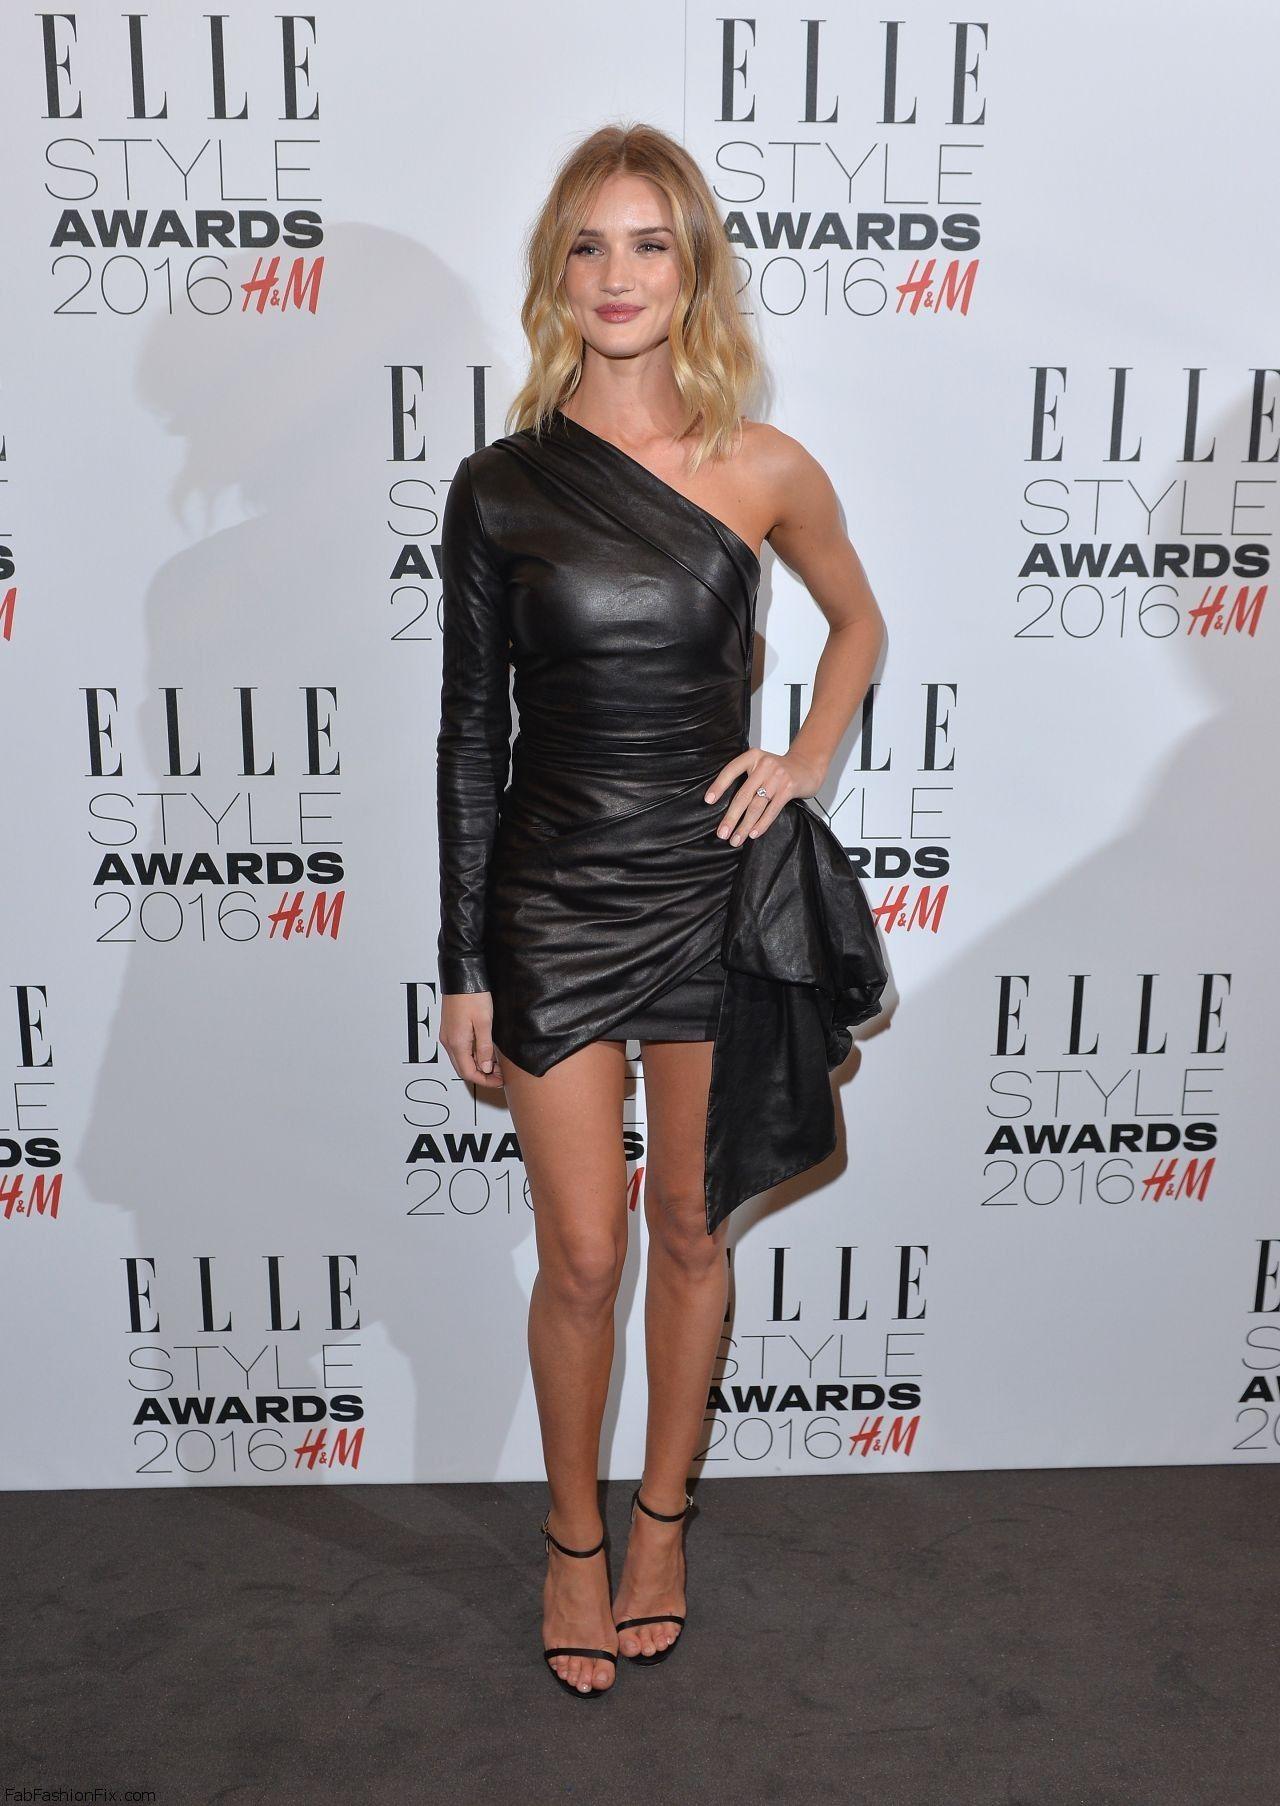 Rosie Huntington - Whiteley shows her legs in Roberto Cavalli leather mini dress at 2016 ELLE Style Awards (February 2016). #rosiehuntingtonwhiteley